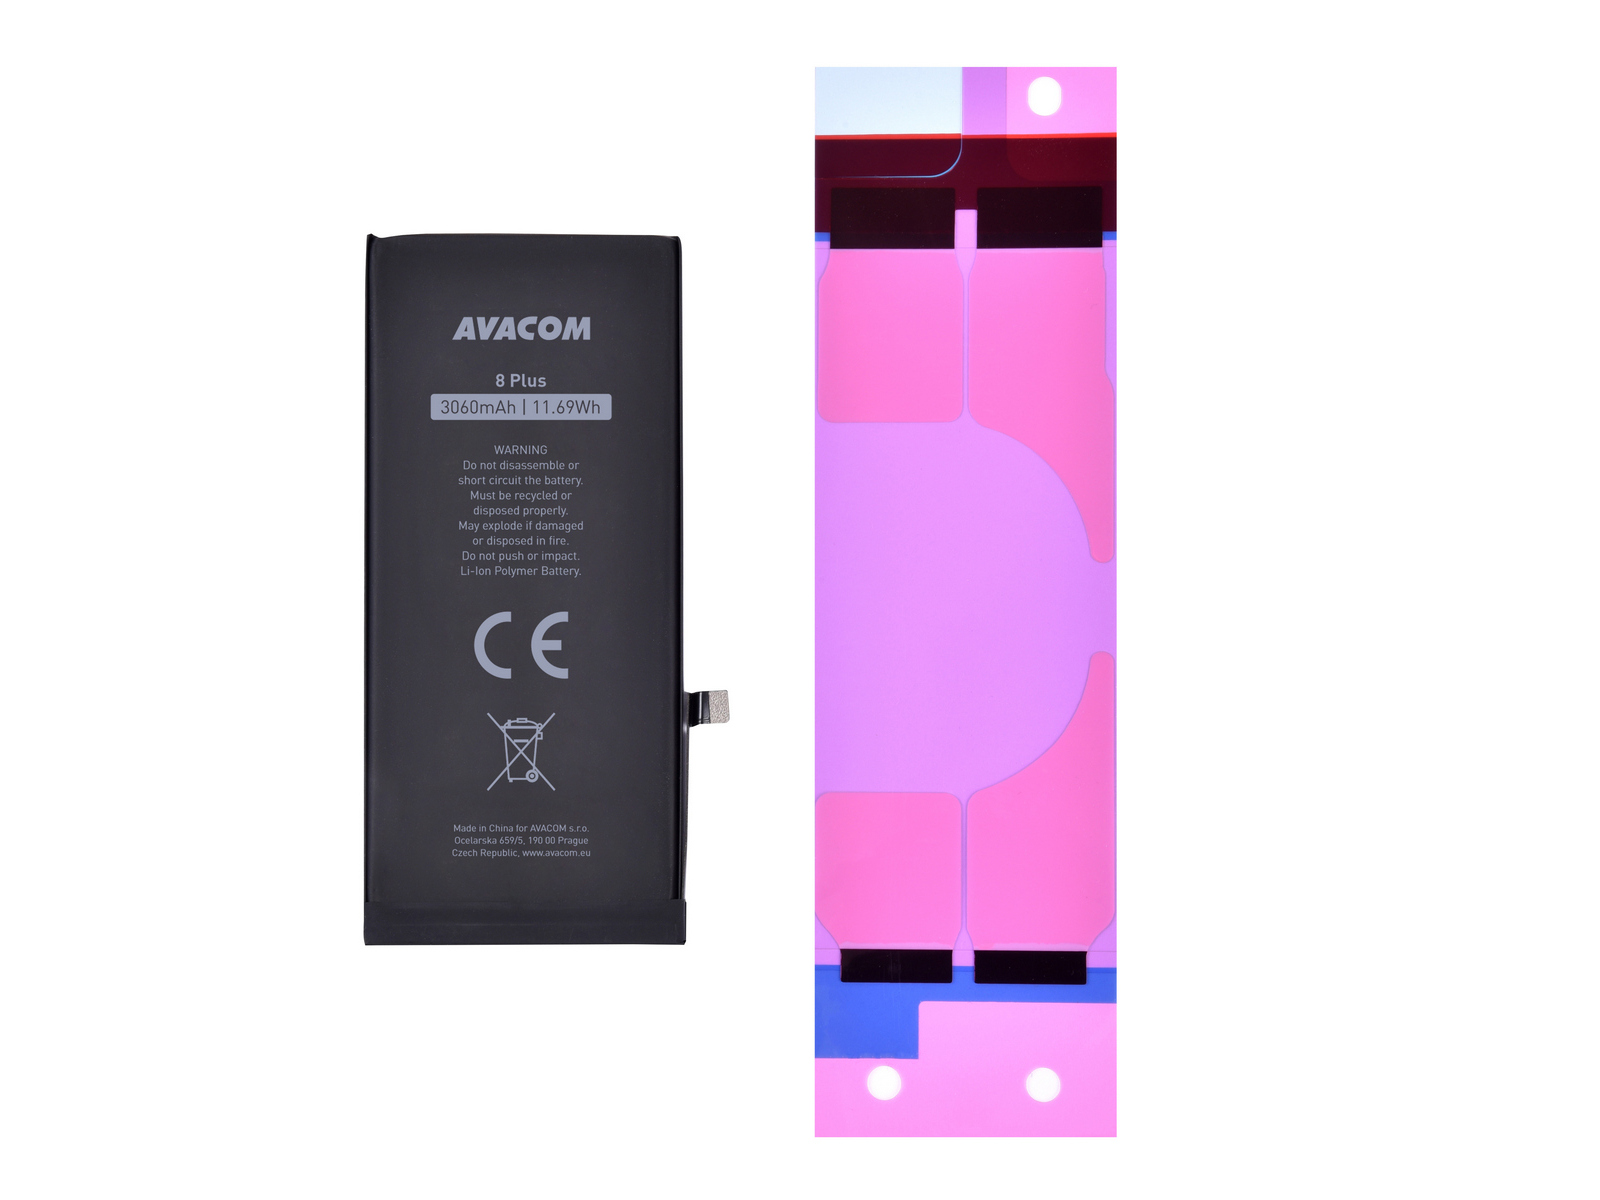 AVACOM baterie pro Apple iPhone 8 Plus - vysokokapacitní, Li-Ion 3,82V 3060mAh (náhrada 616-00367)